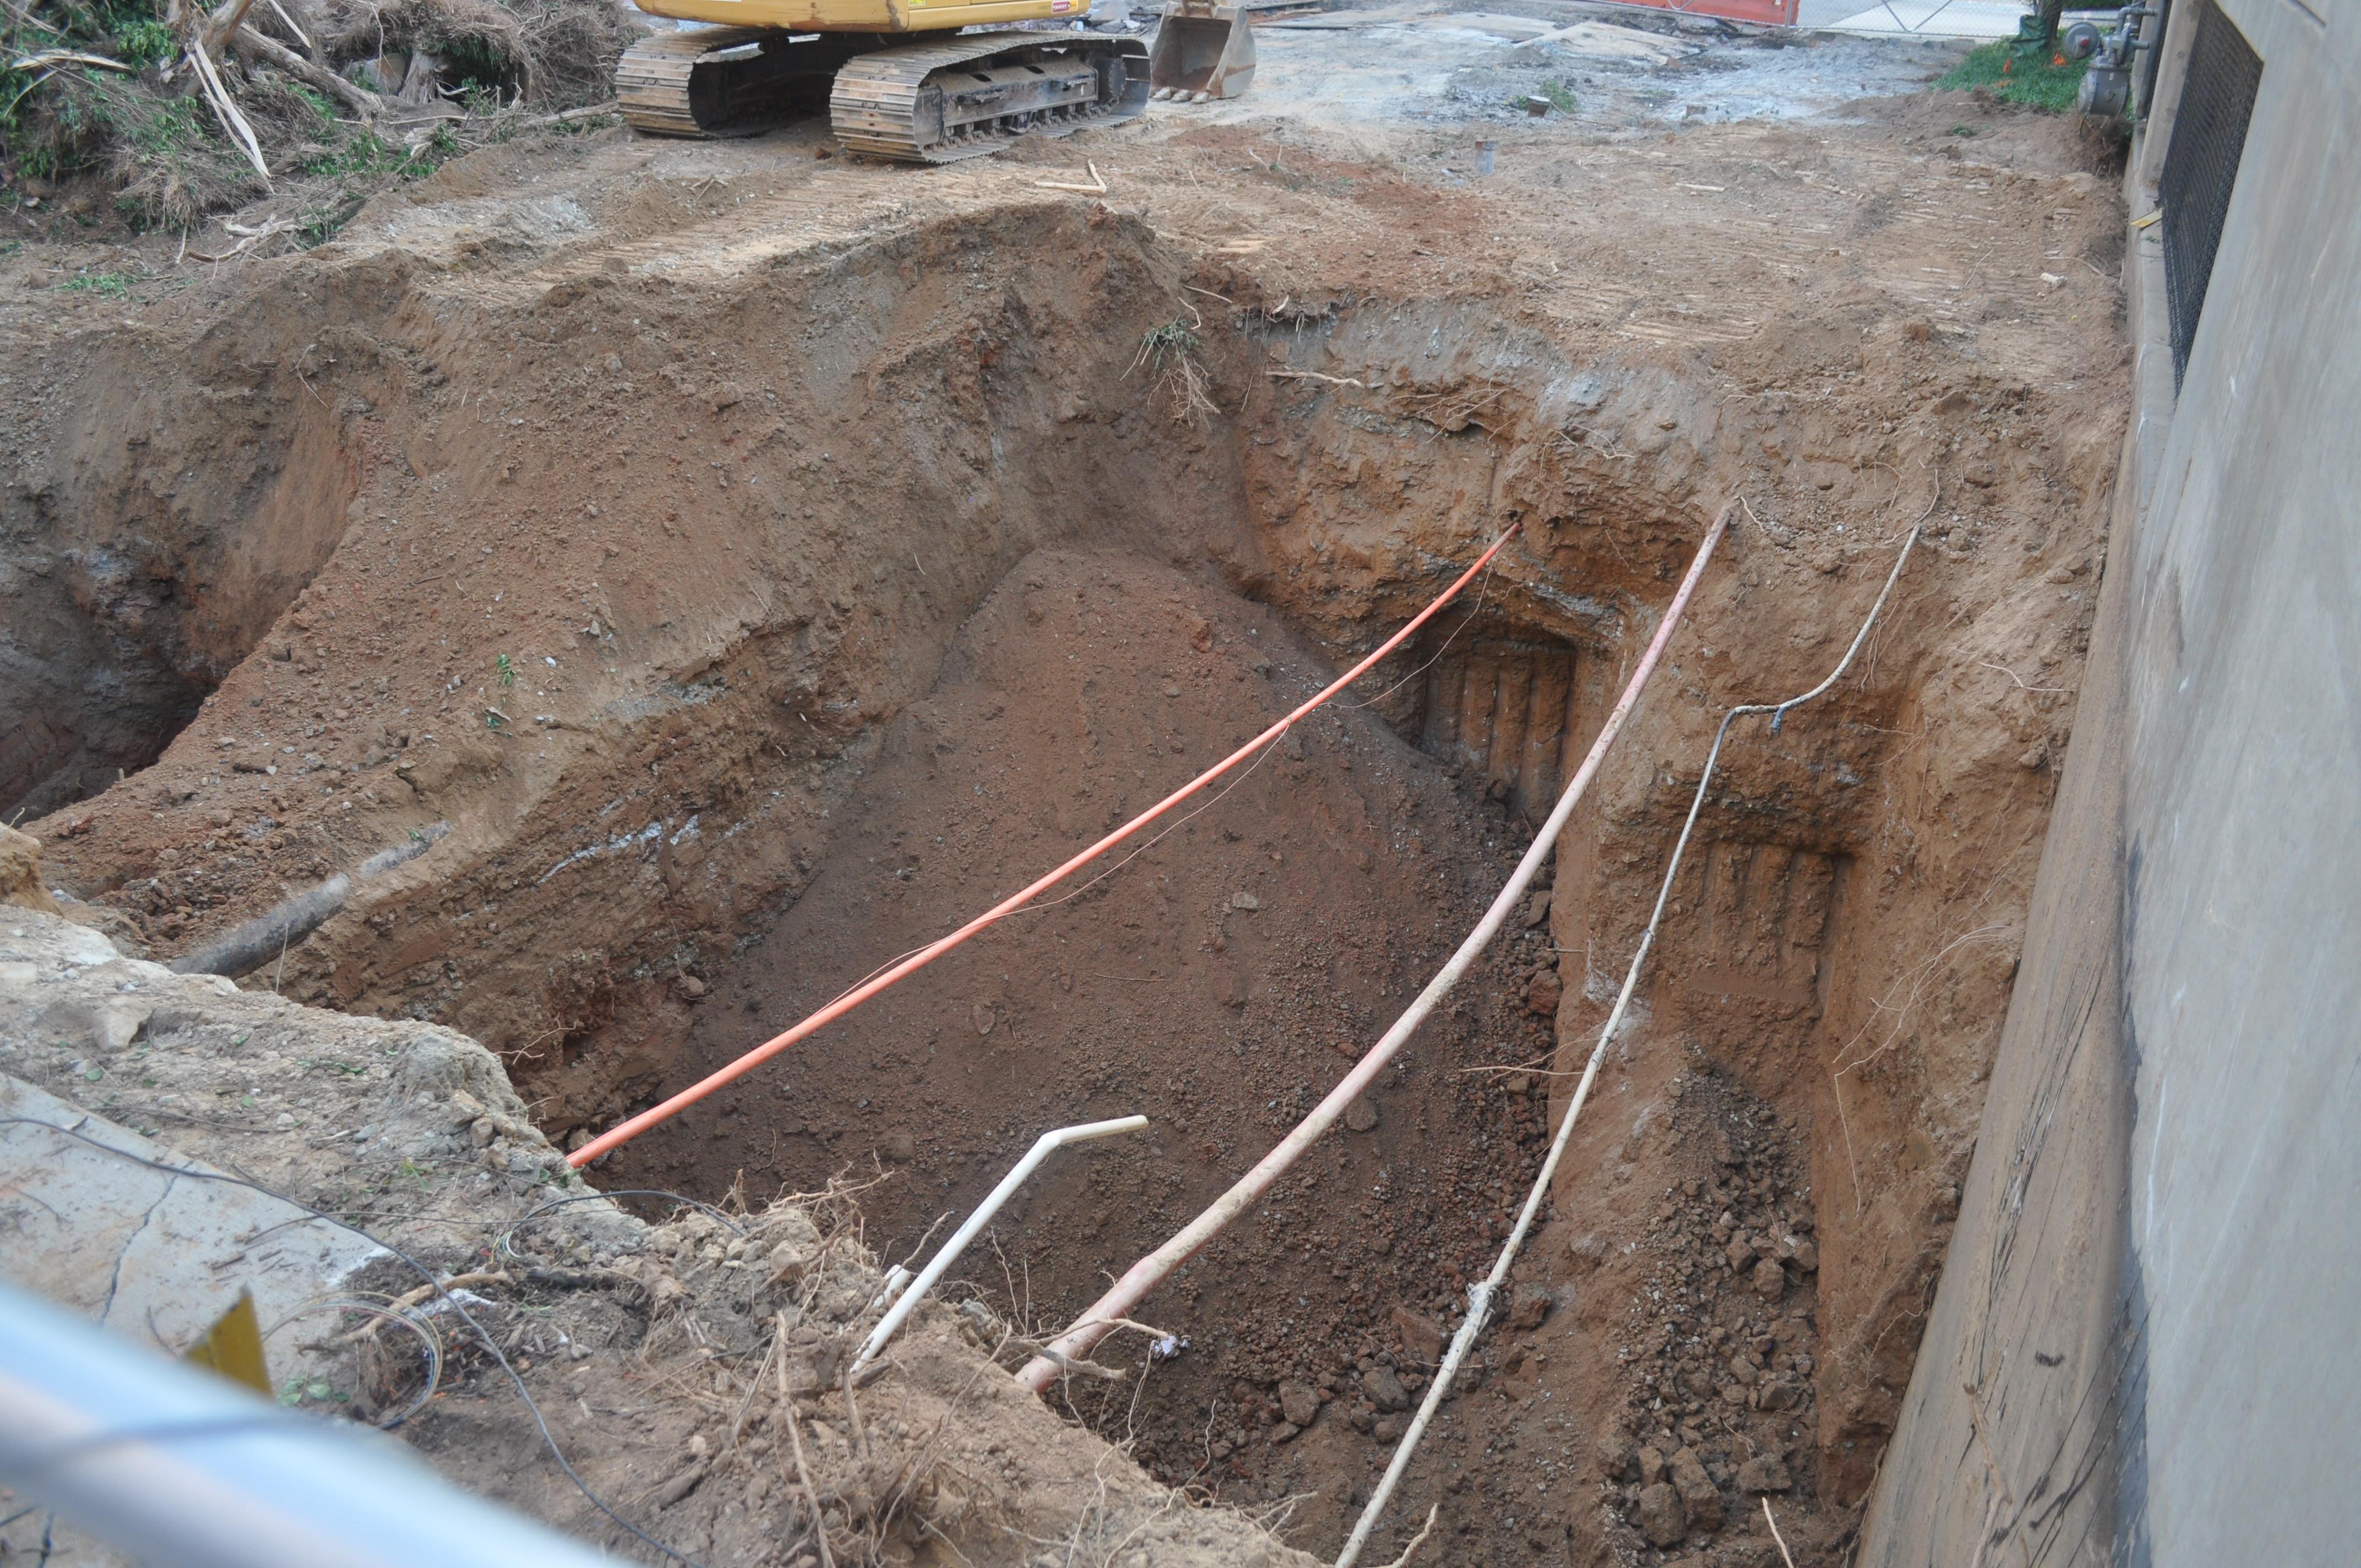 photos midtown atlanta sinkhole grows as crews search for clues